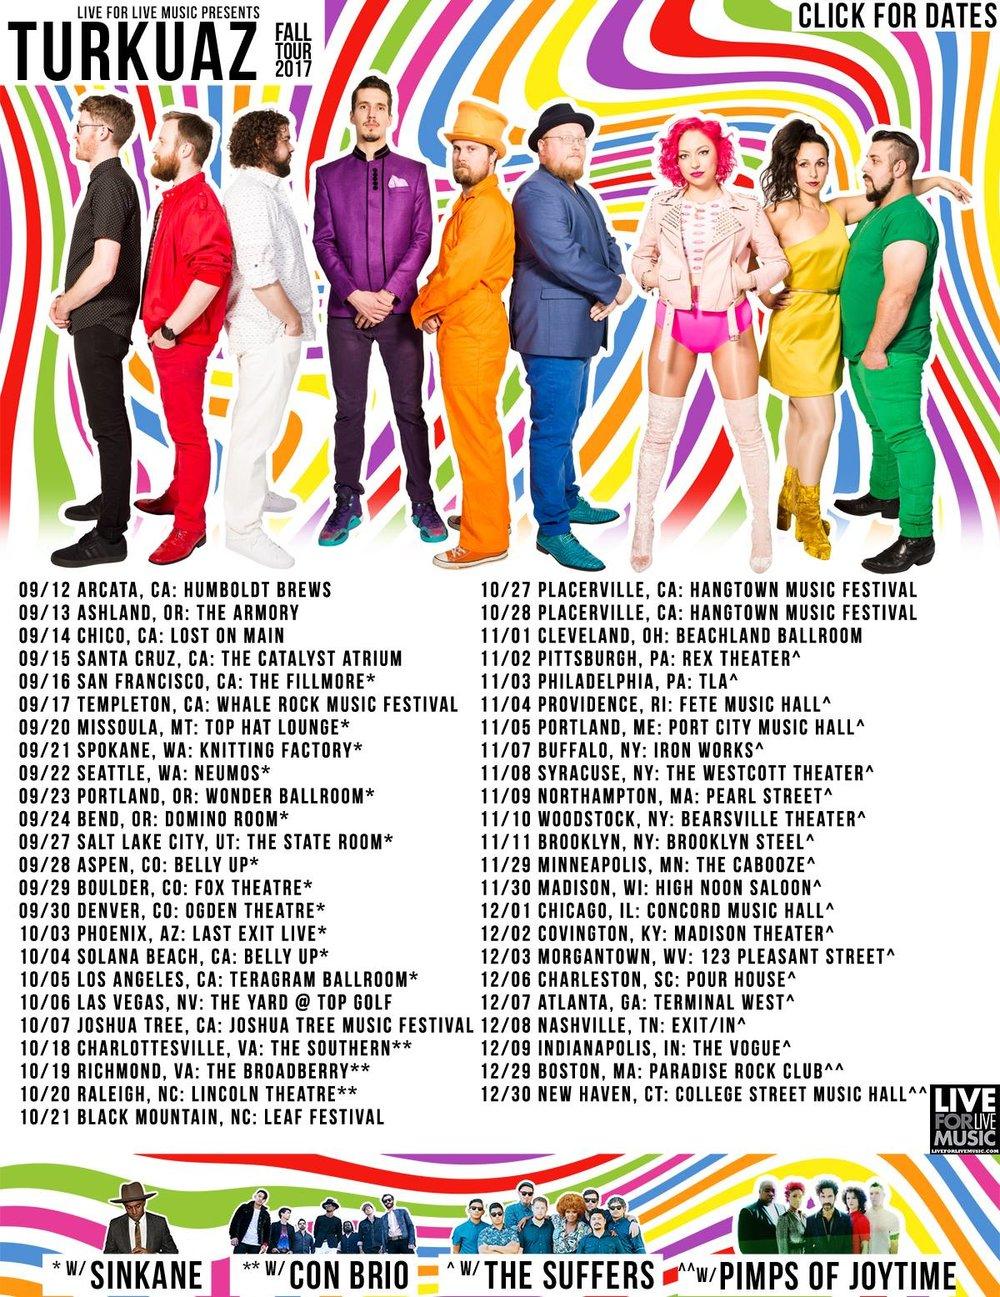 2017 Fall Tour .jpg